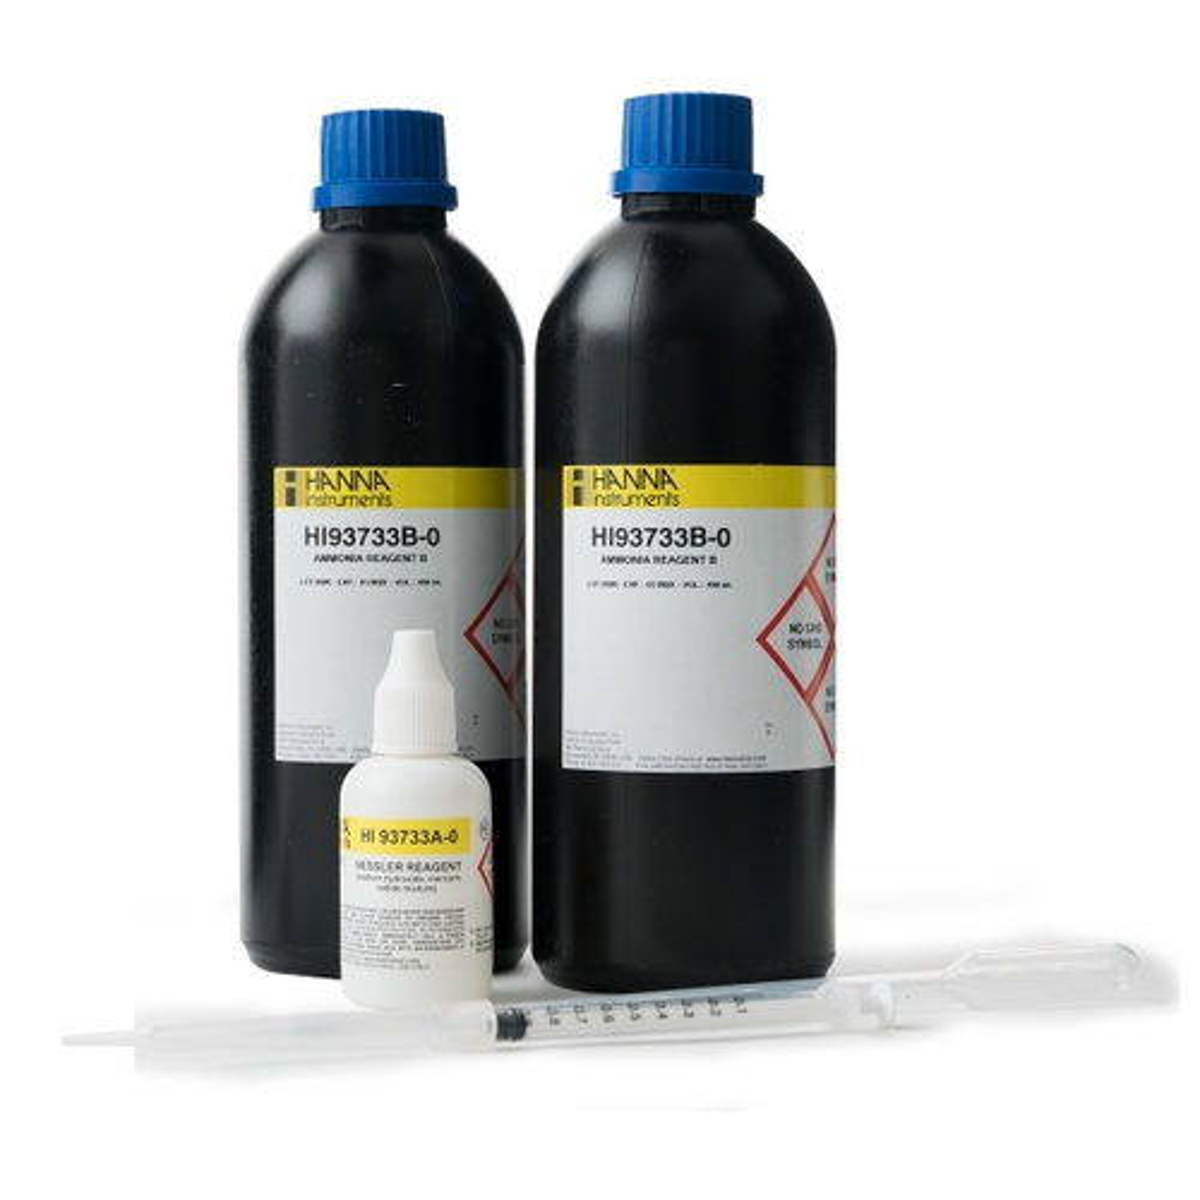 Ammonia High Range Reagents (300 tests) - HI93733-03